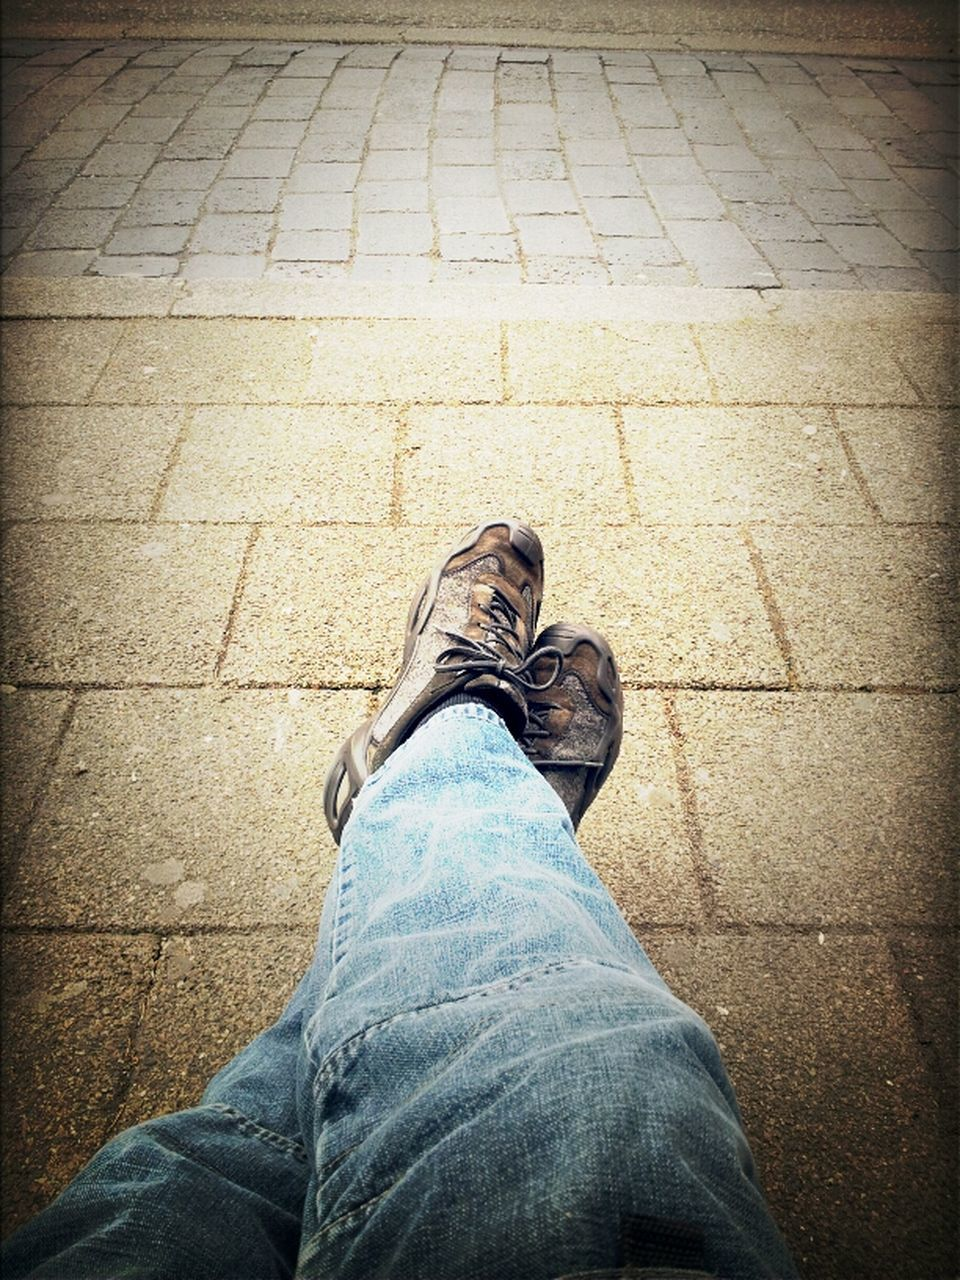 Low Section Of Man Sitting On Sidewalk